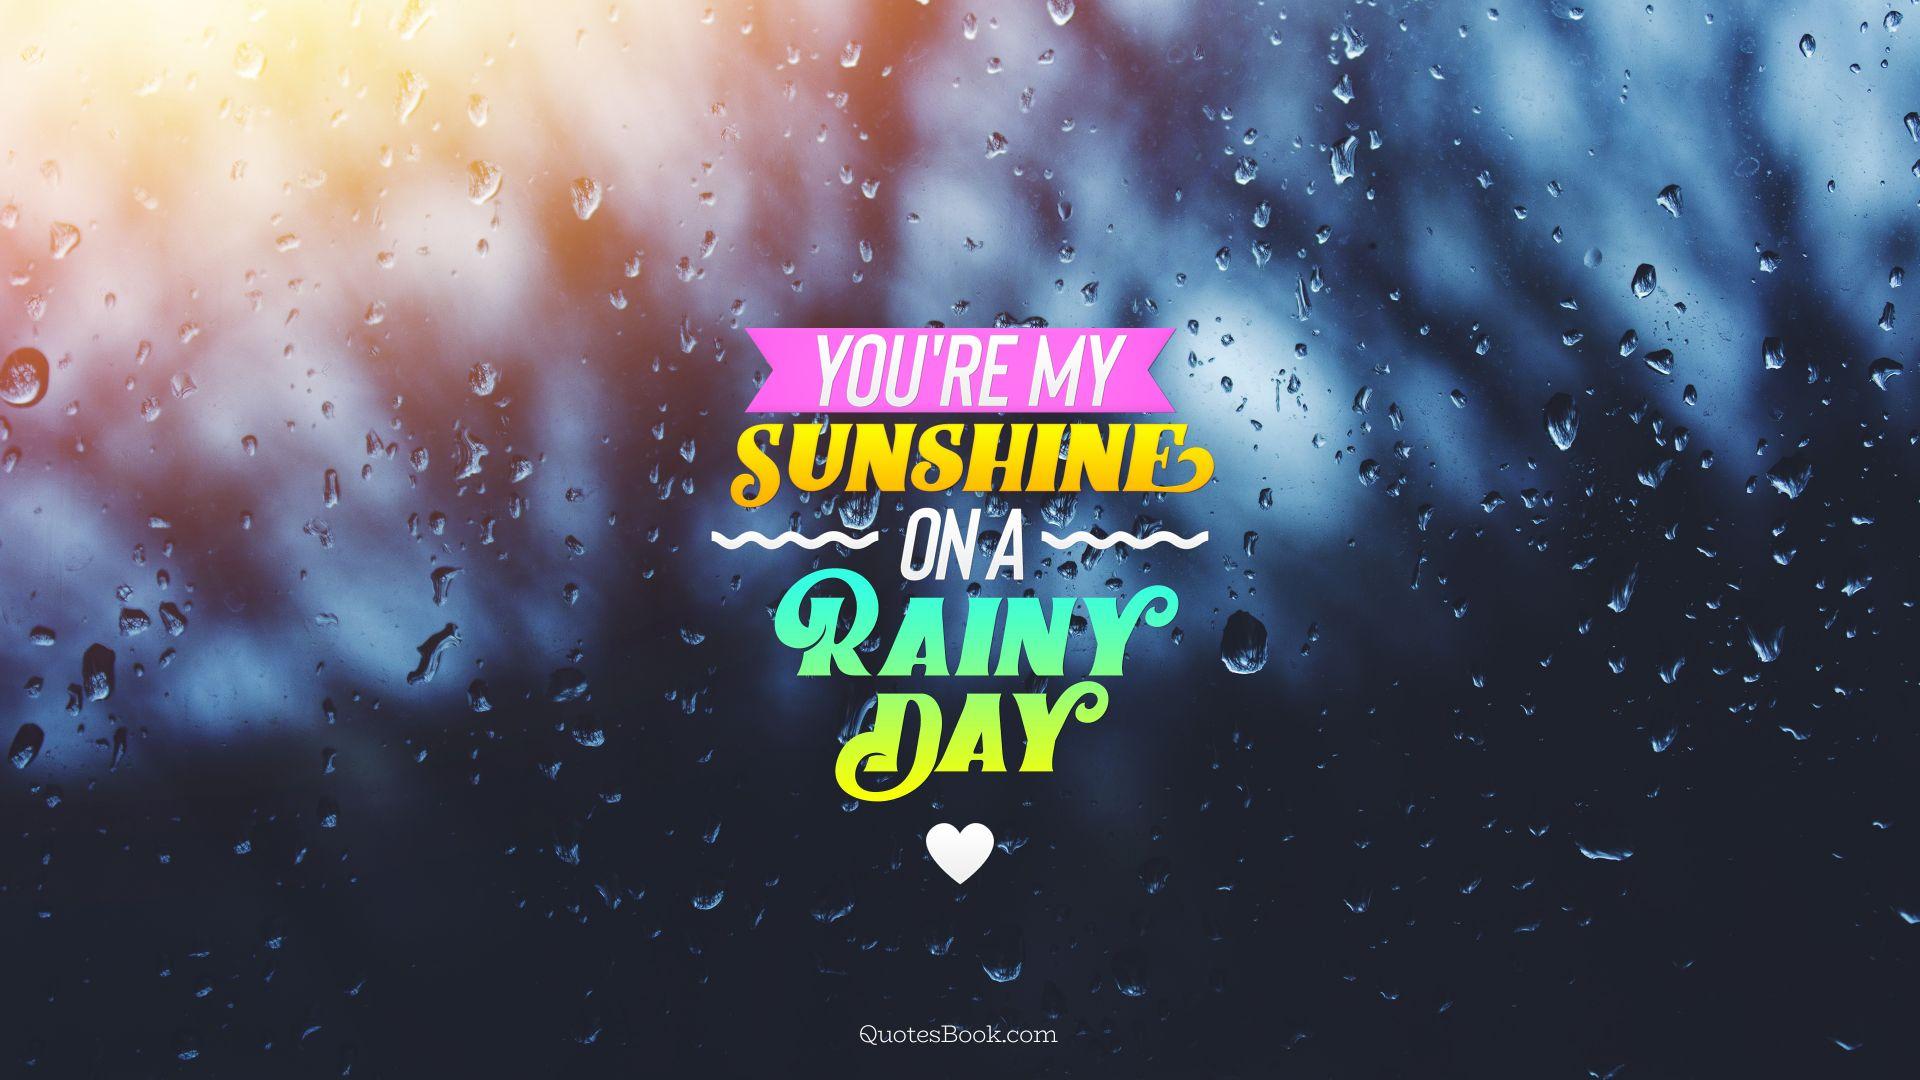 ... day You're my sunshine on a rainy ...